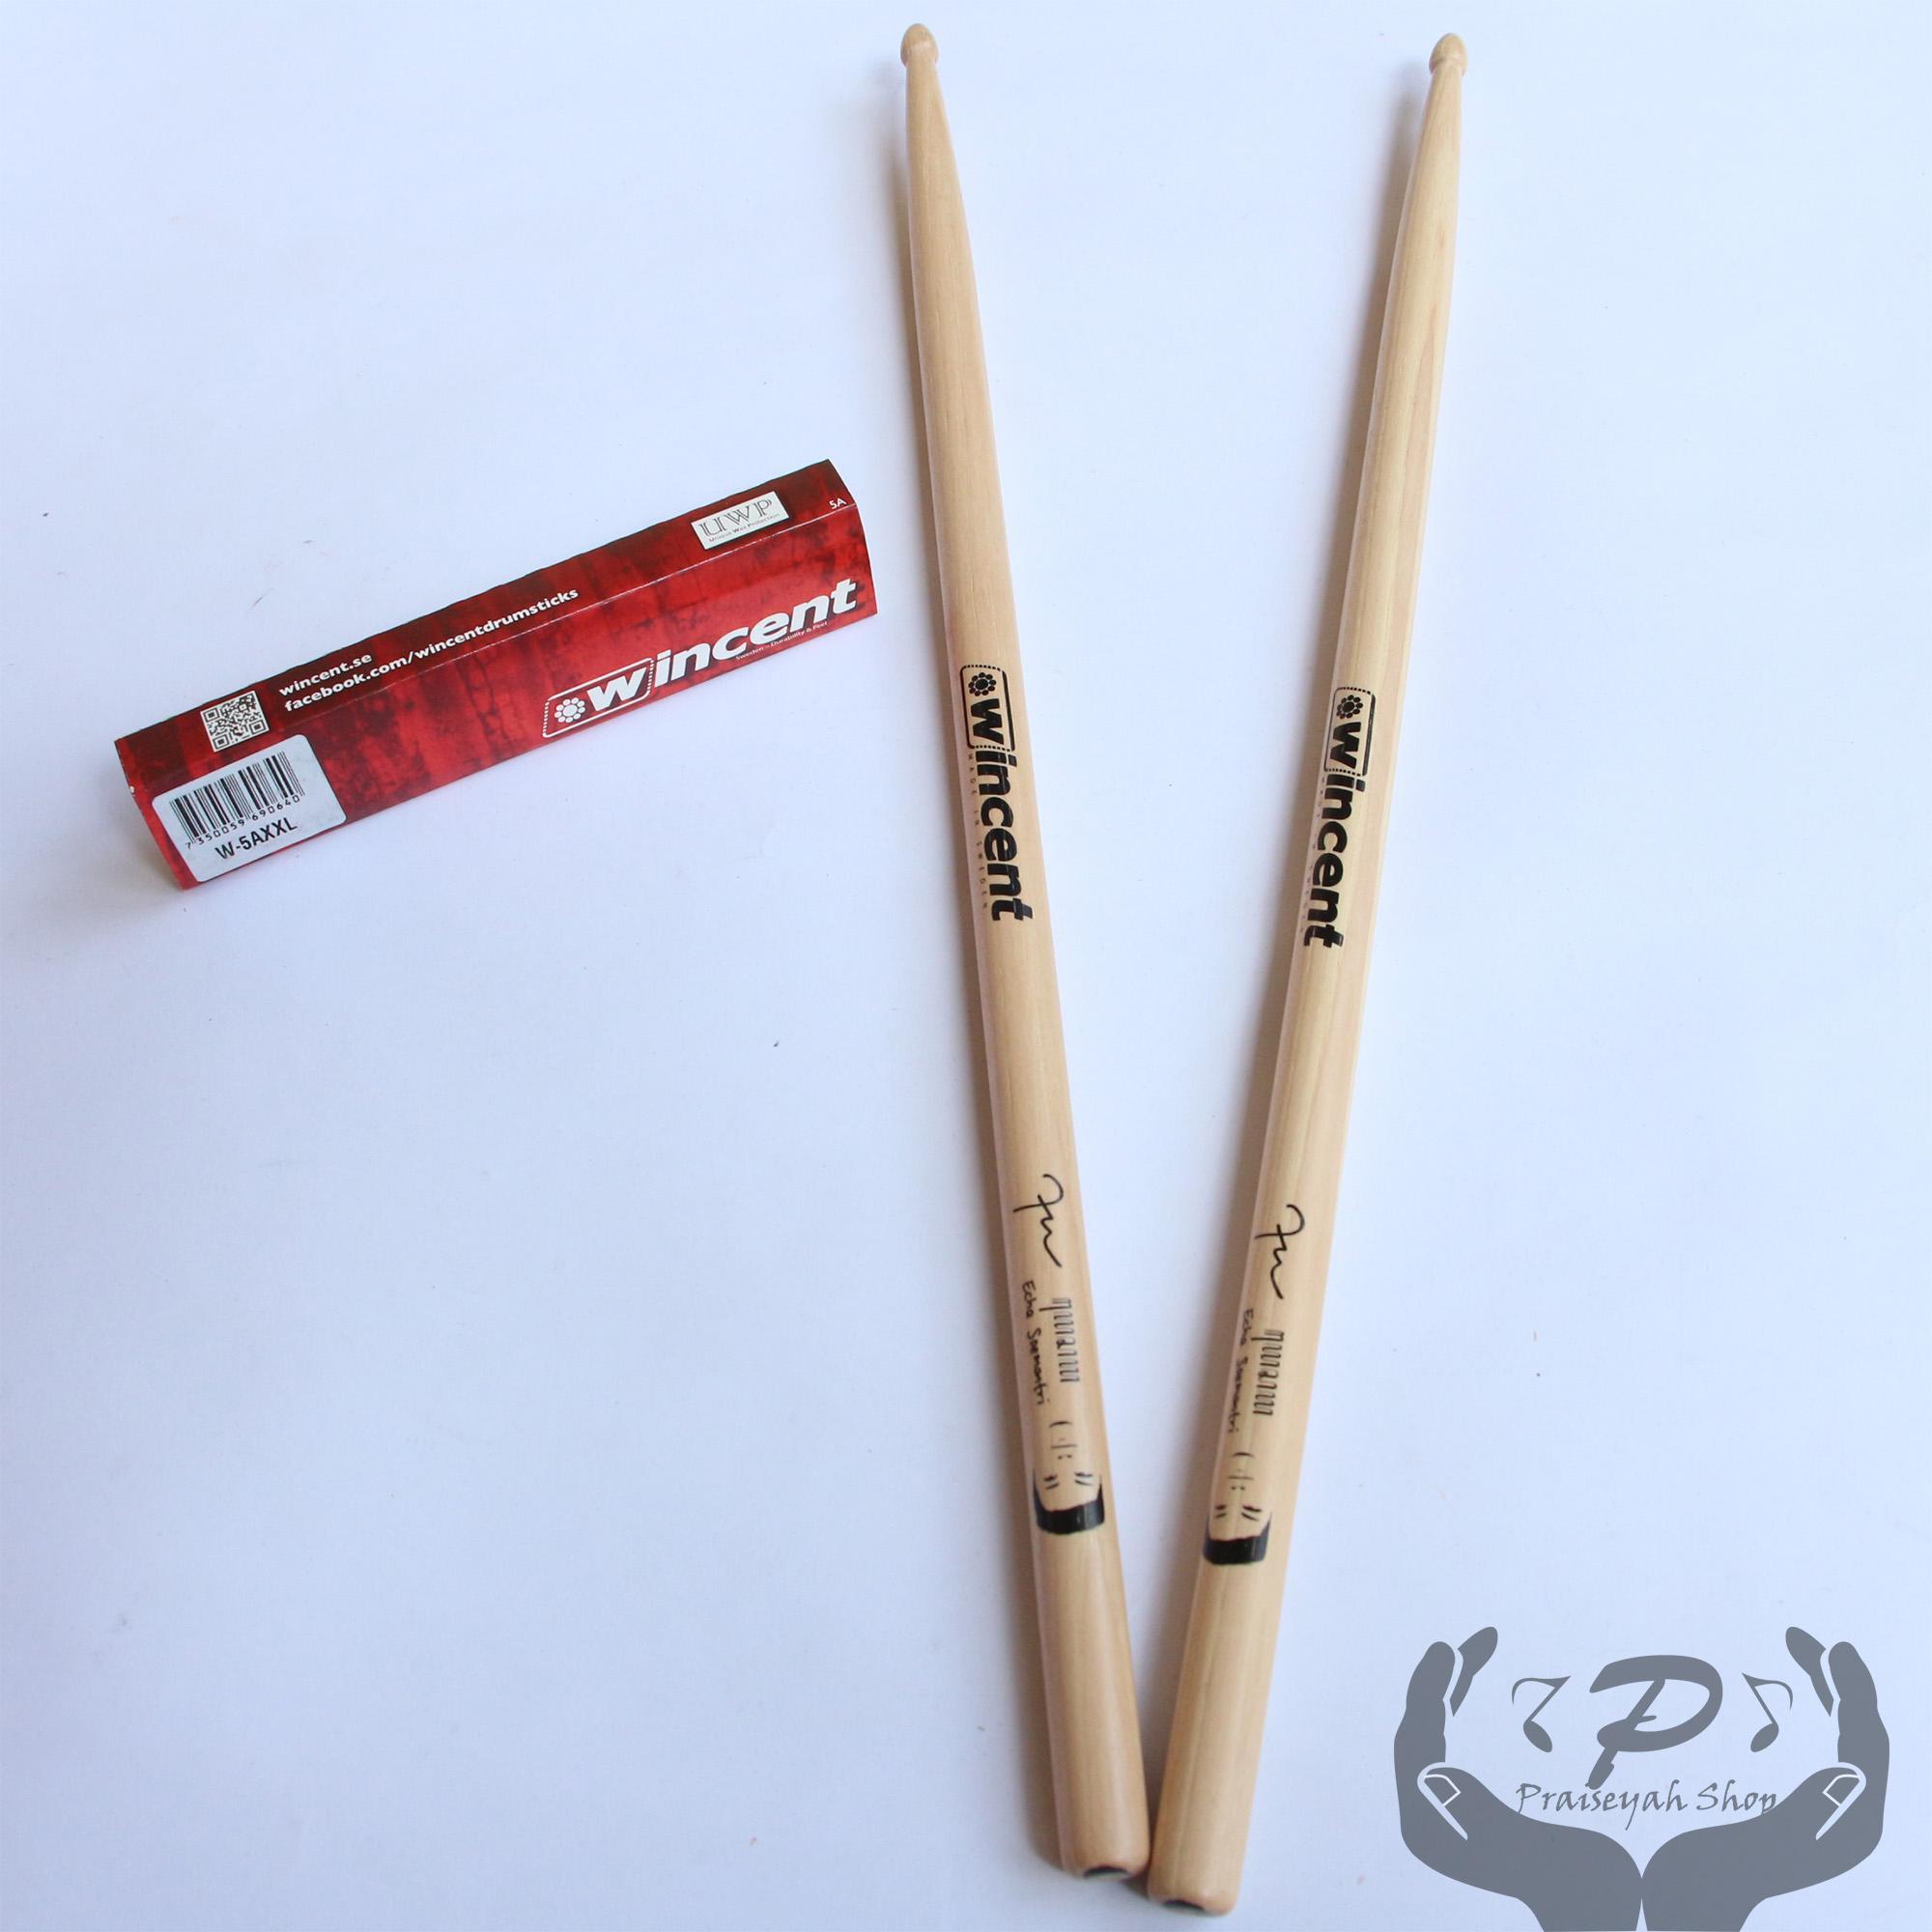 Jual Aksesoris Drum Murah Berkualitas Alat Musik Stik Stick Zildjian Tama Sonor Echa Soemantri Signature Wincent Es Panjang 5a Xxl Ori